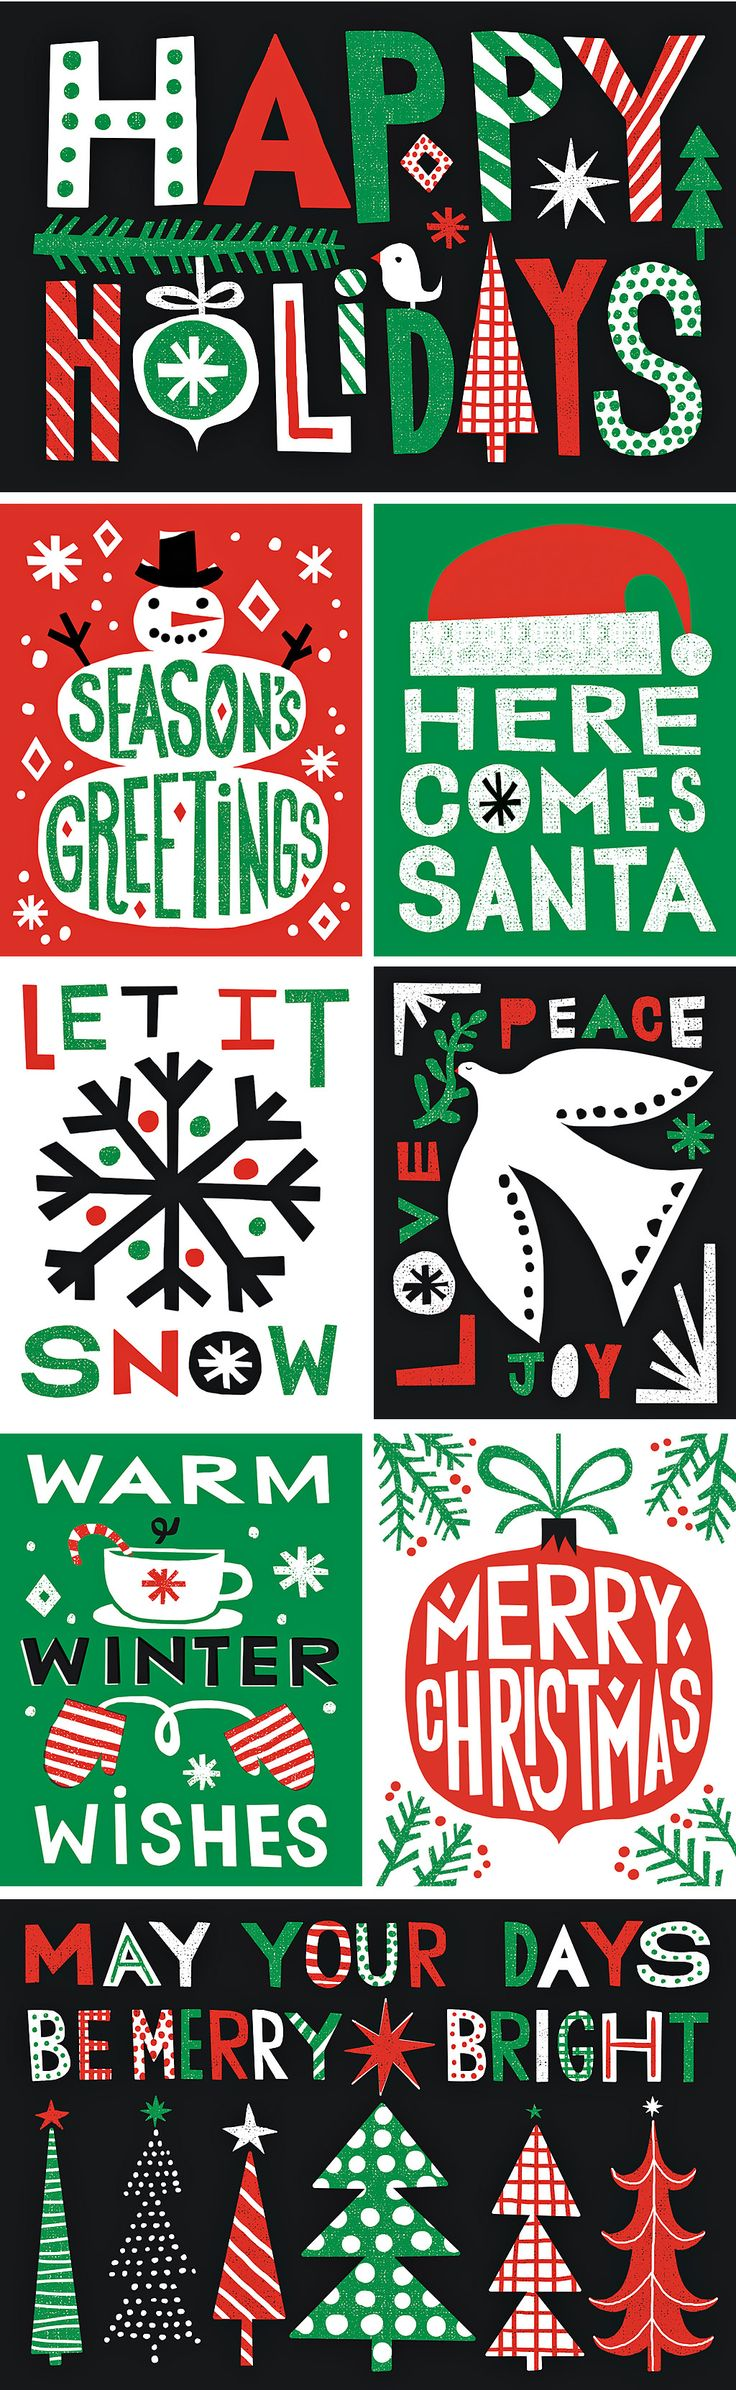 SID16794R_Christmas_Whimsy_Happy_Holidays.jpg